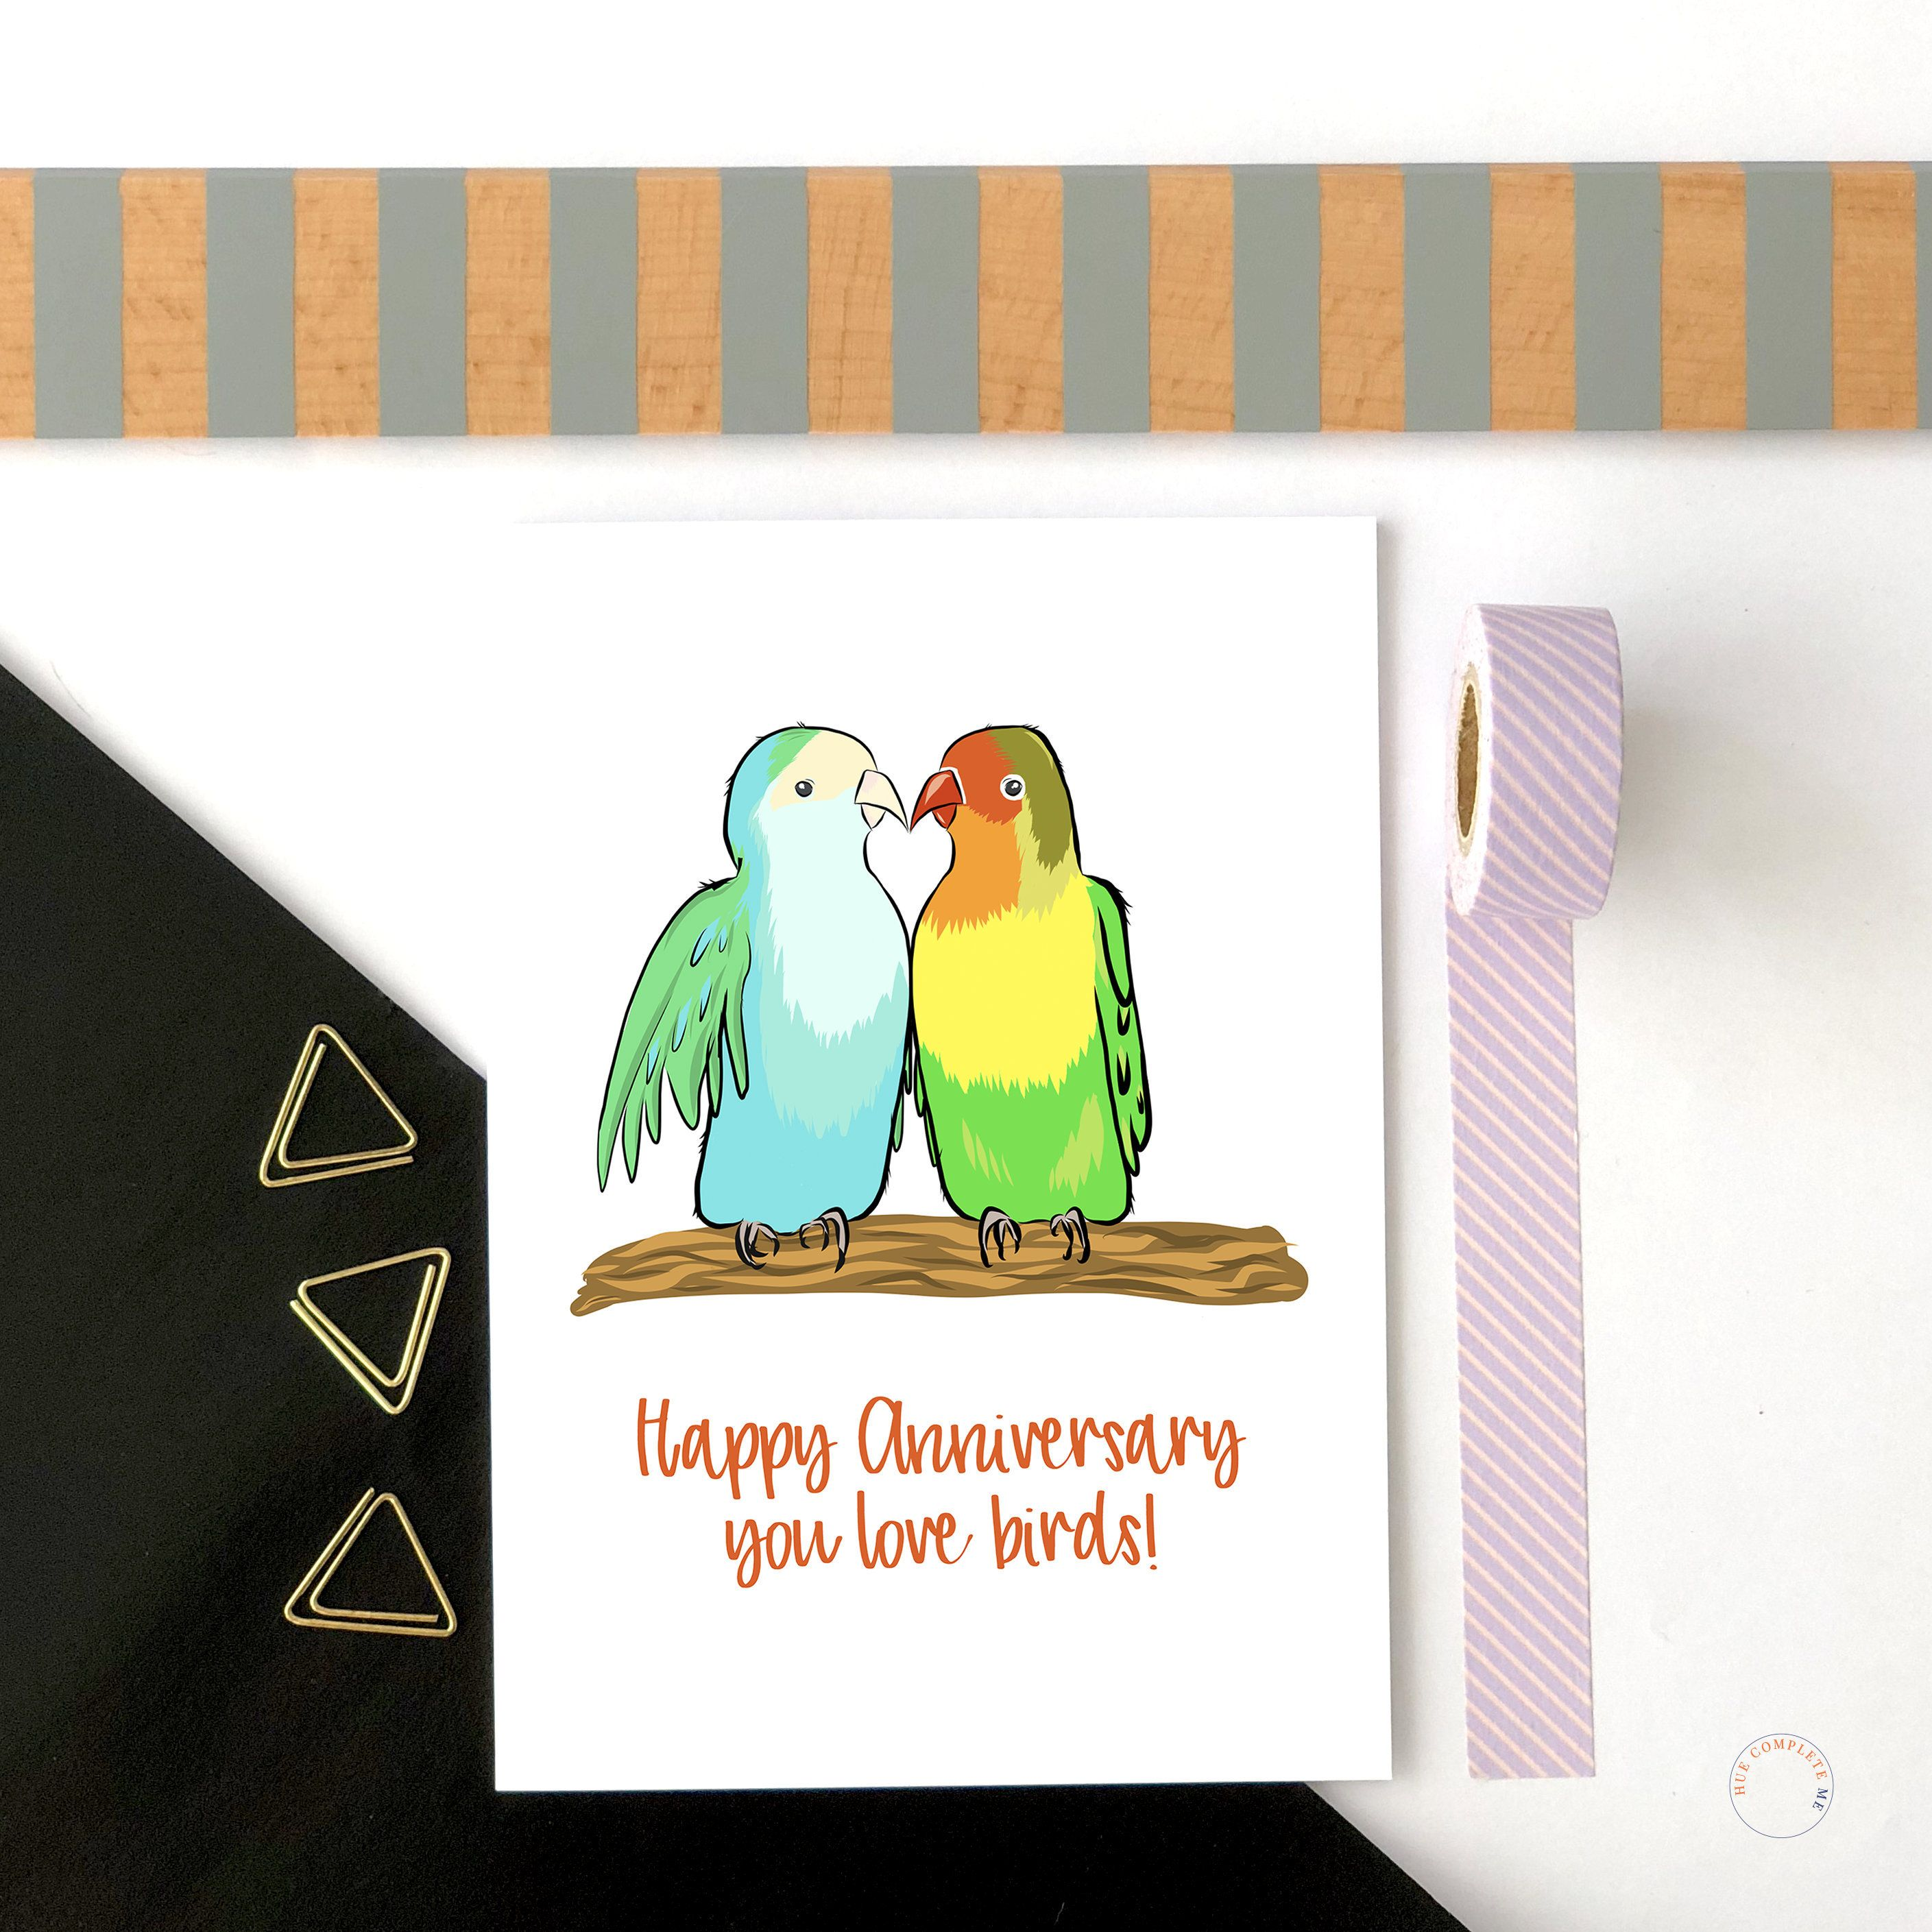 Happy Anniversary You Love Birds Love Bird Anniversary Card Etsy Happy Anniversary Cards Anniversary Cards Wedding Anniversary Cards